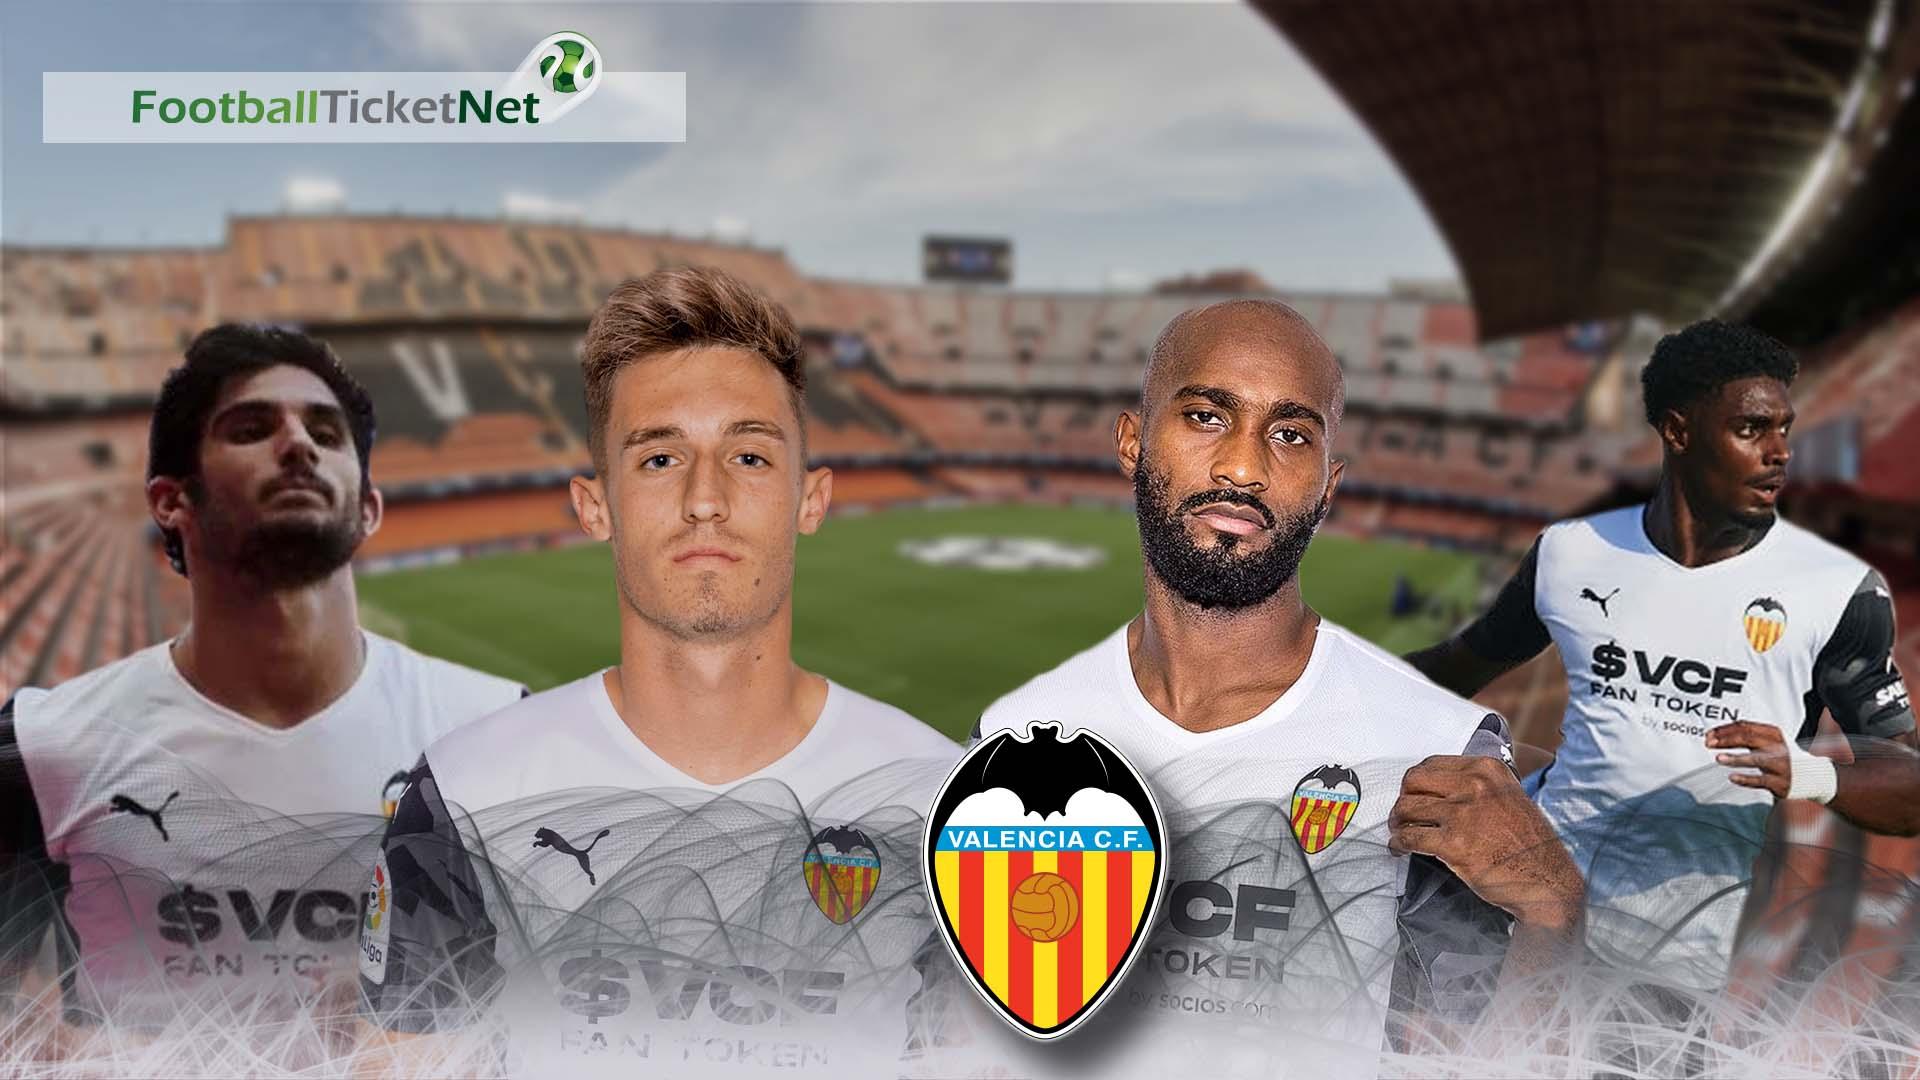 Buy Valencia CF Tickets 2020/21 | Football Ticket Net